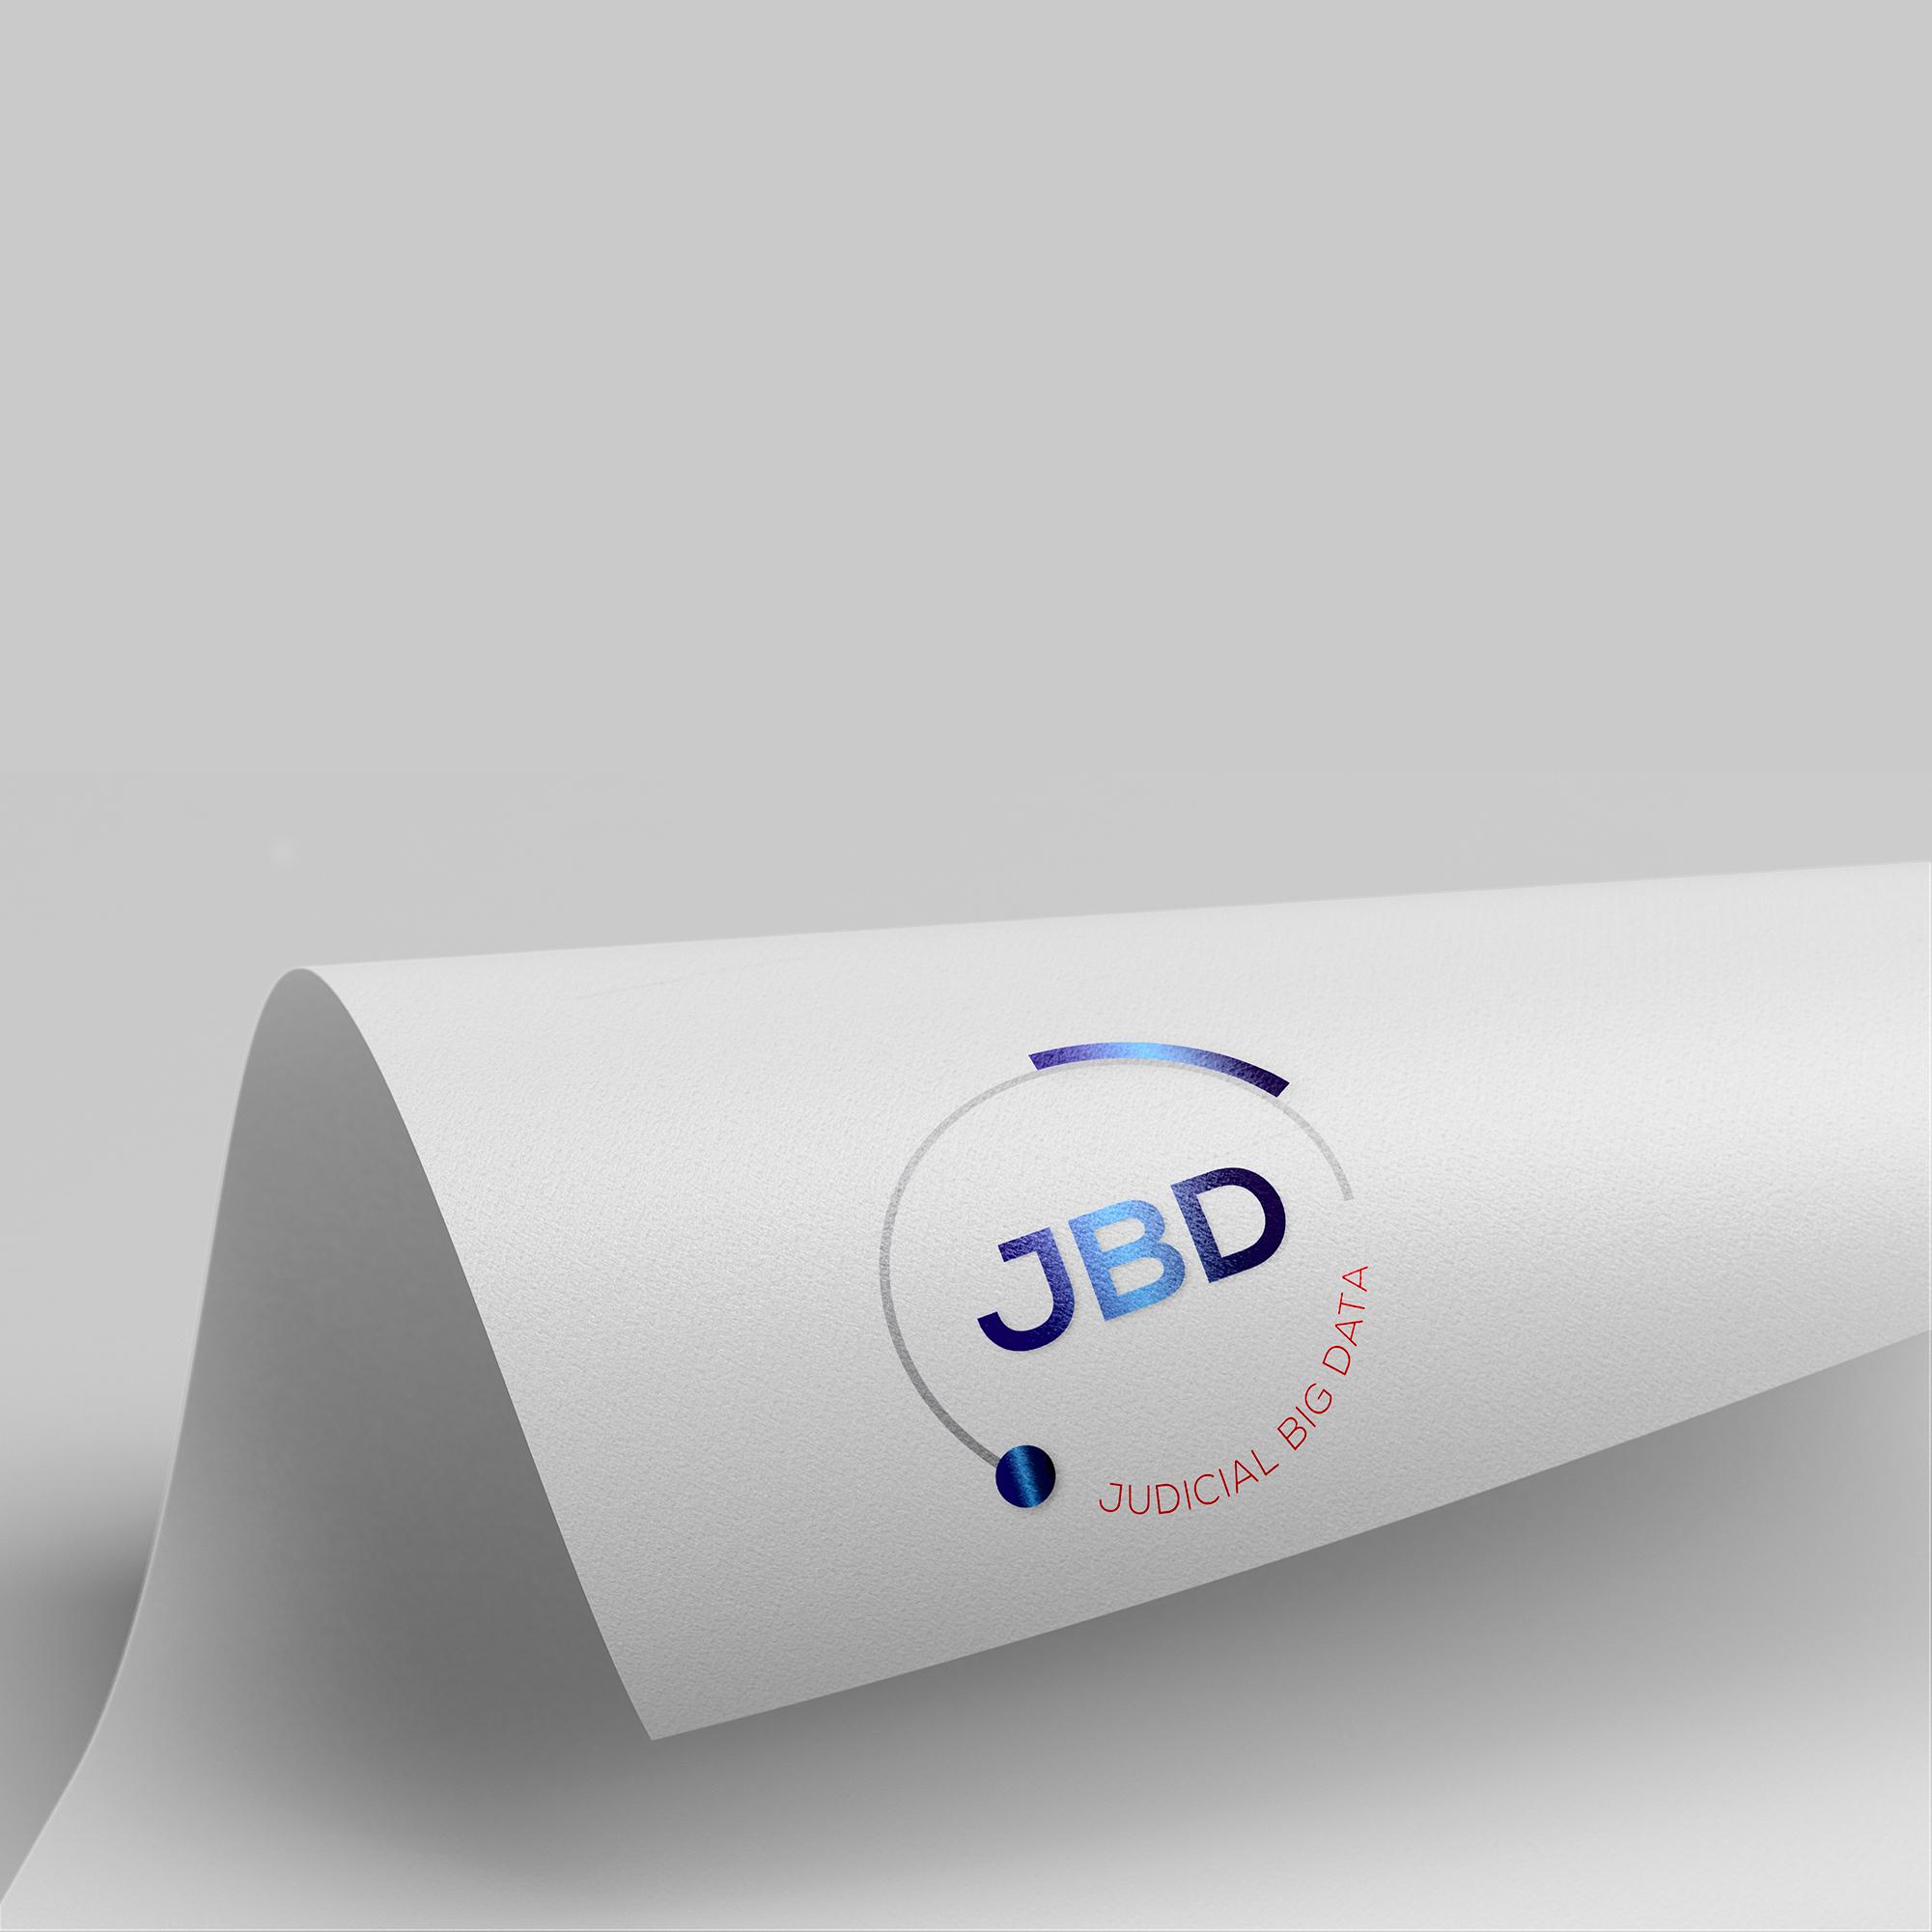 JBD logo